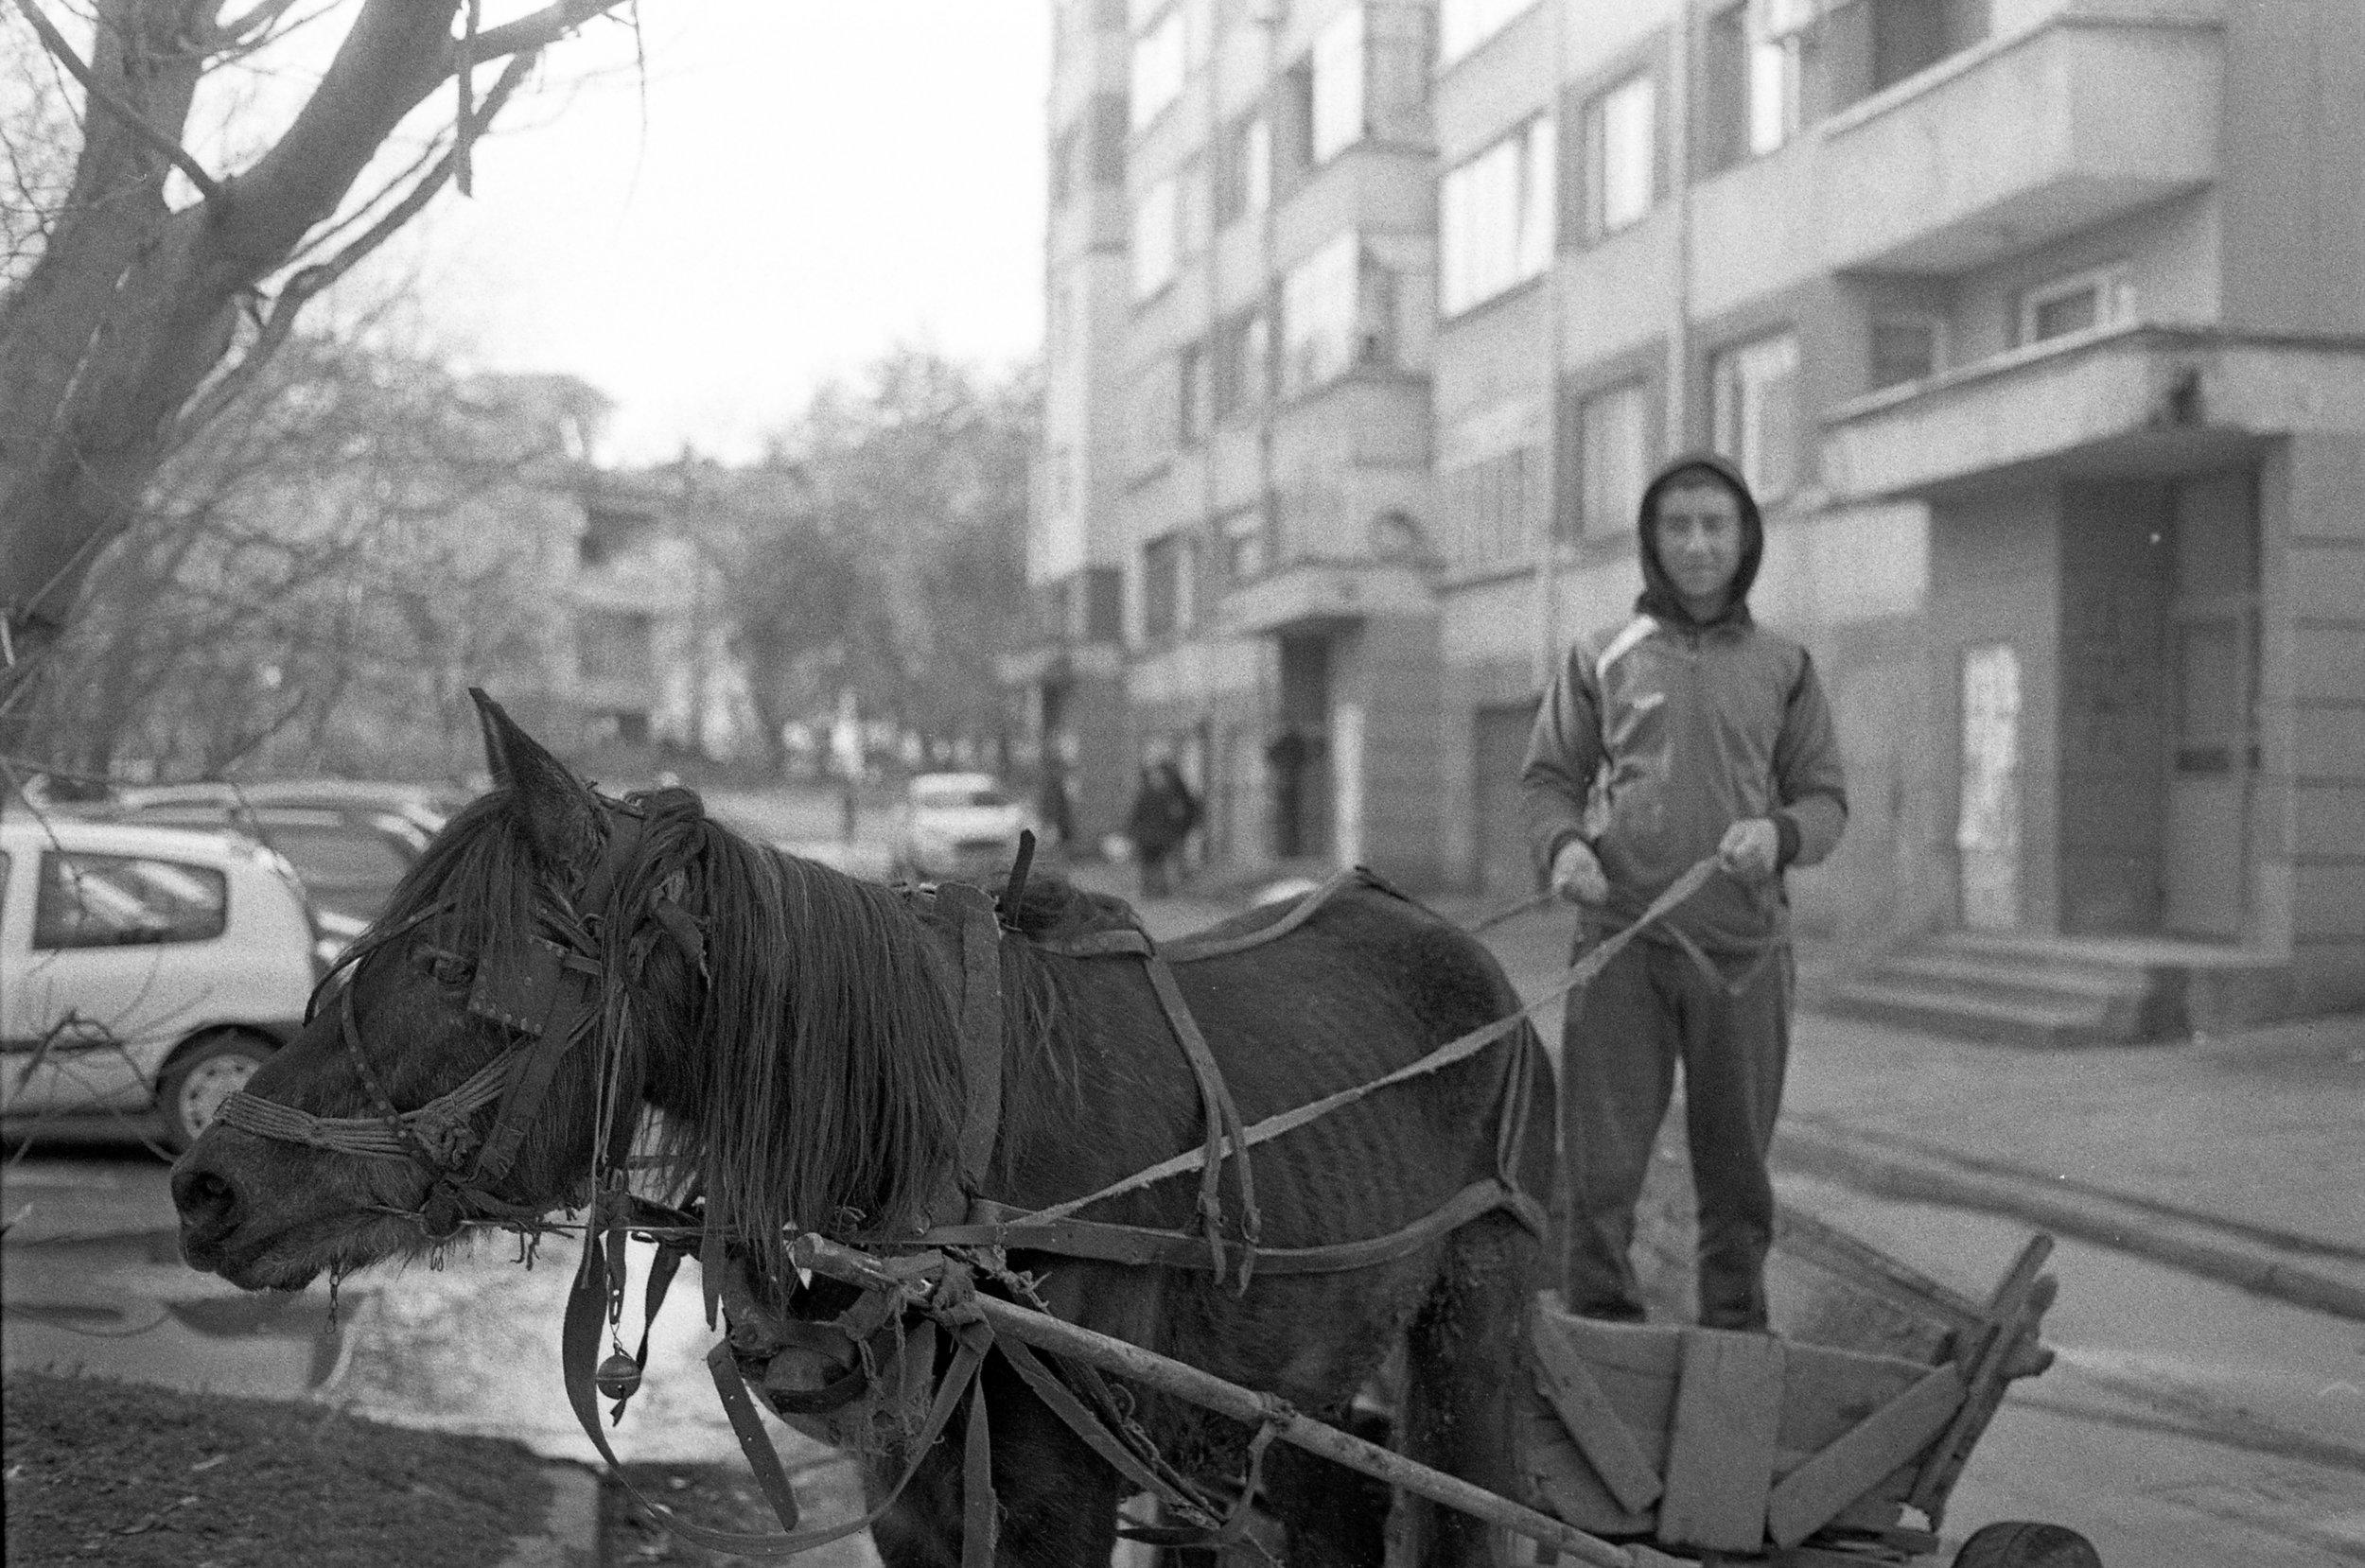 Faceless Roma man (and his horse) copy.jpg